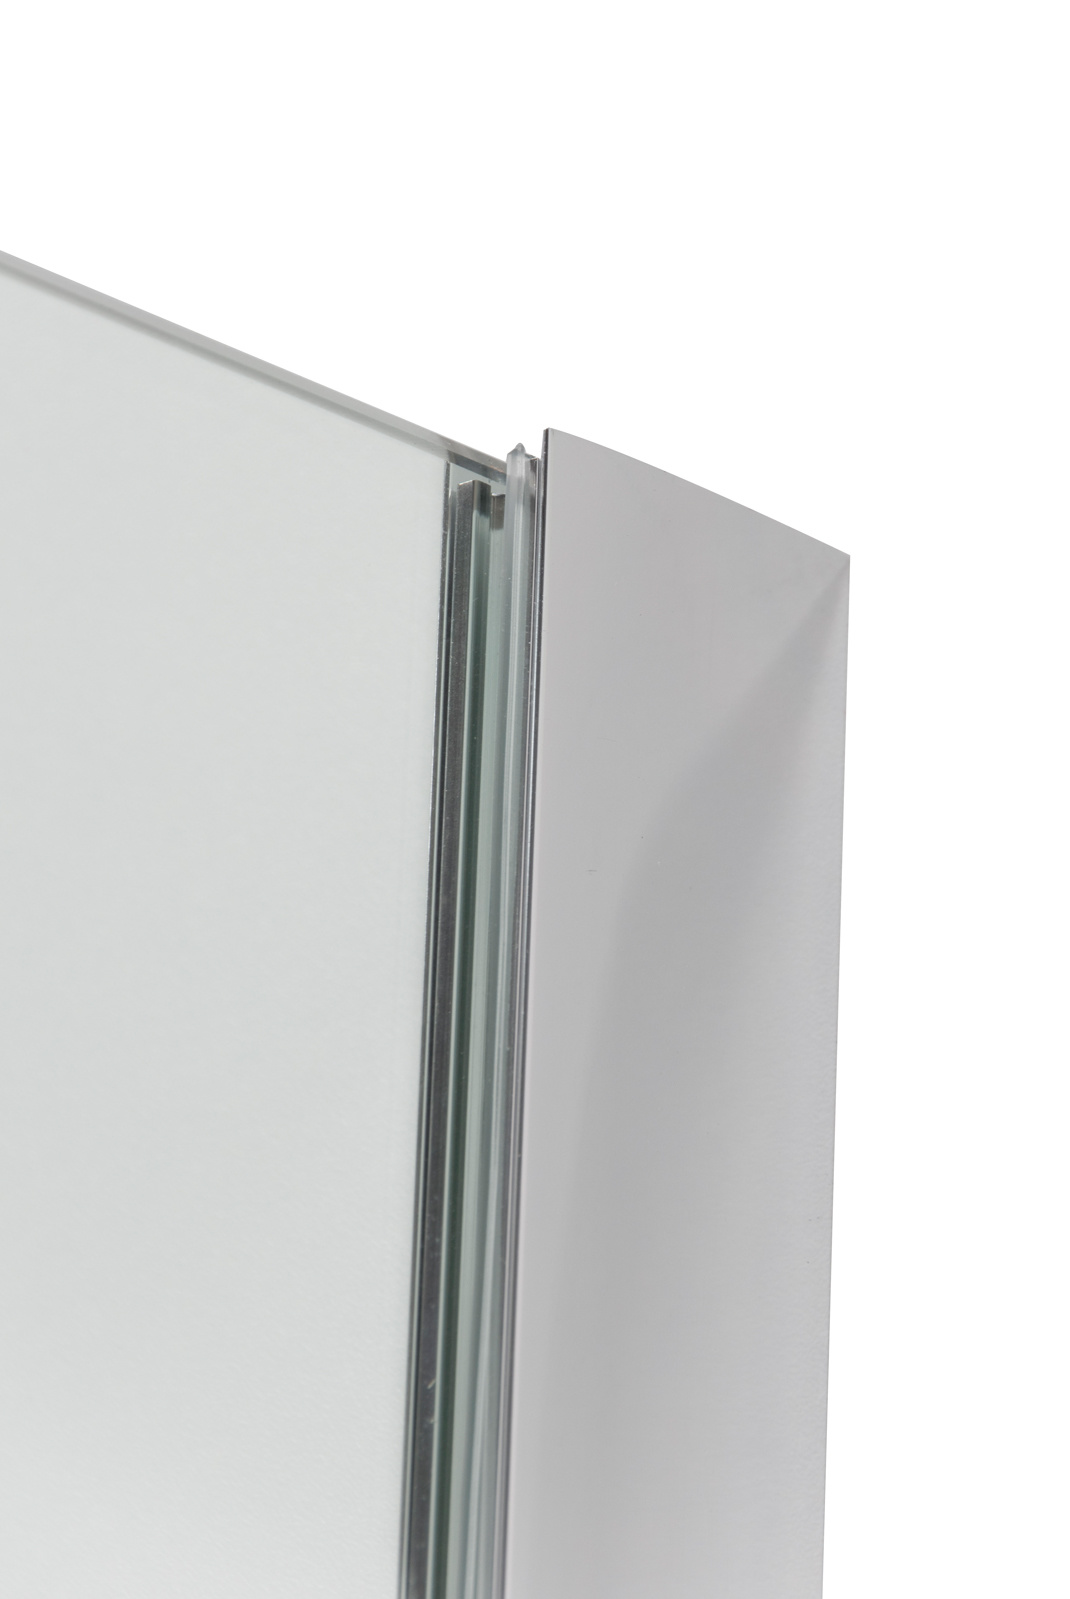 Linea Uno Set Göteborg Nano 100 x 200 cm + Zijwand Tulta Nano 35 x 200 cm